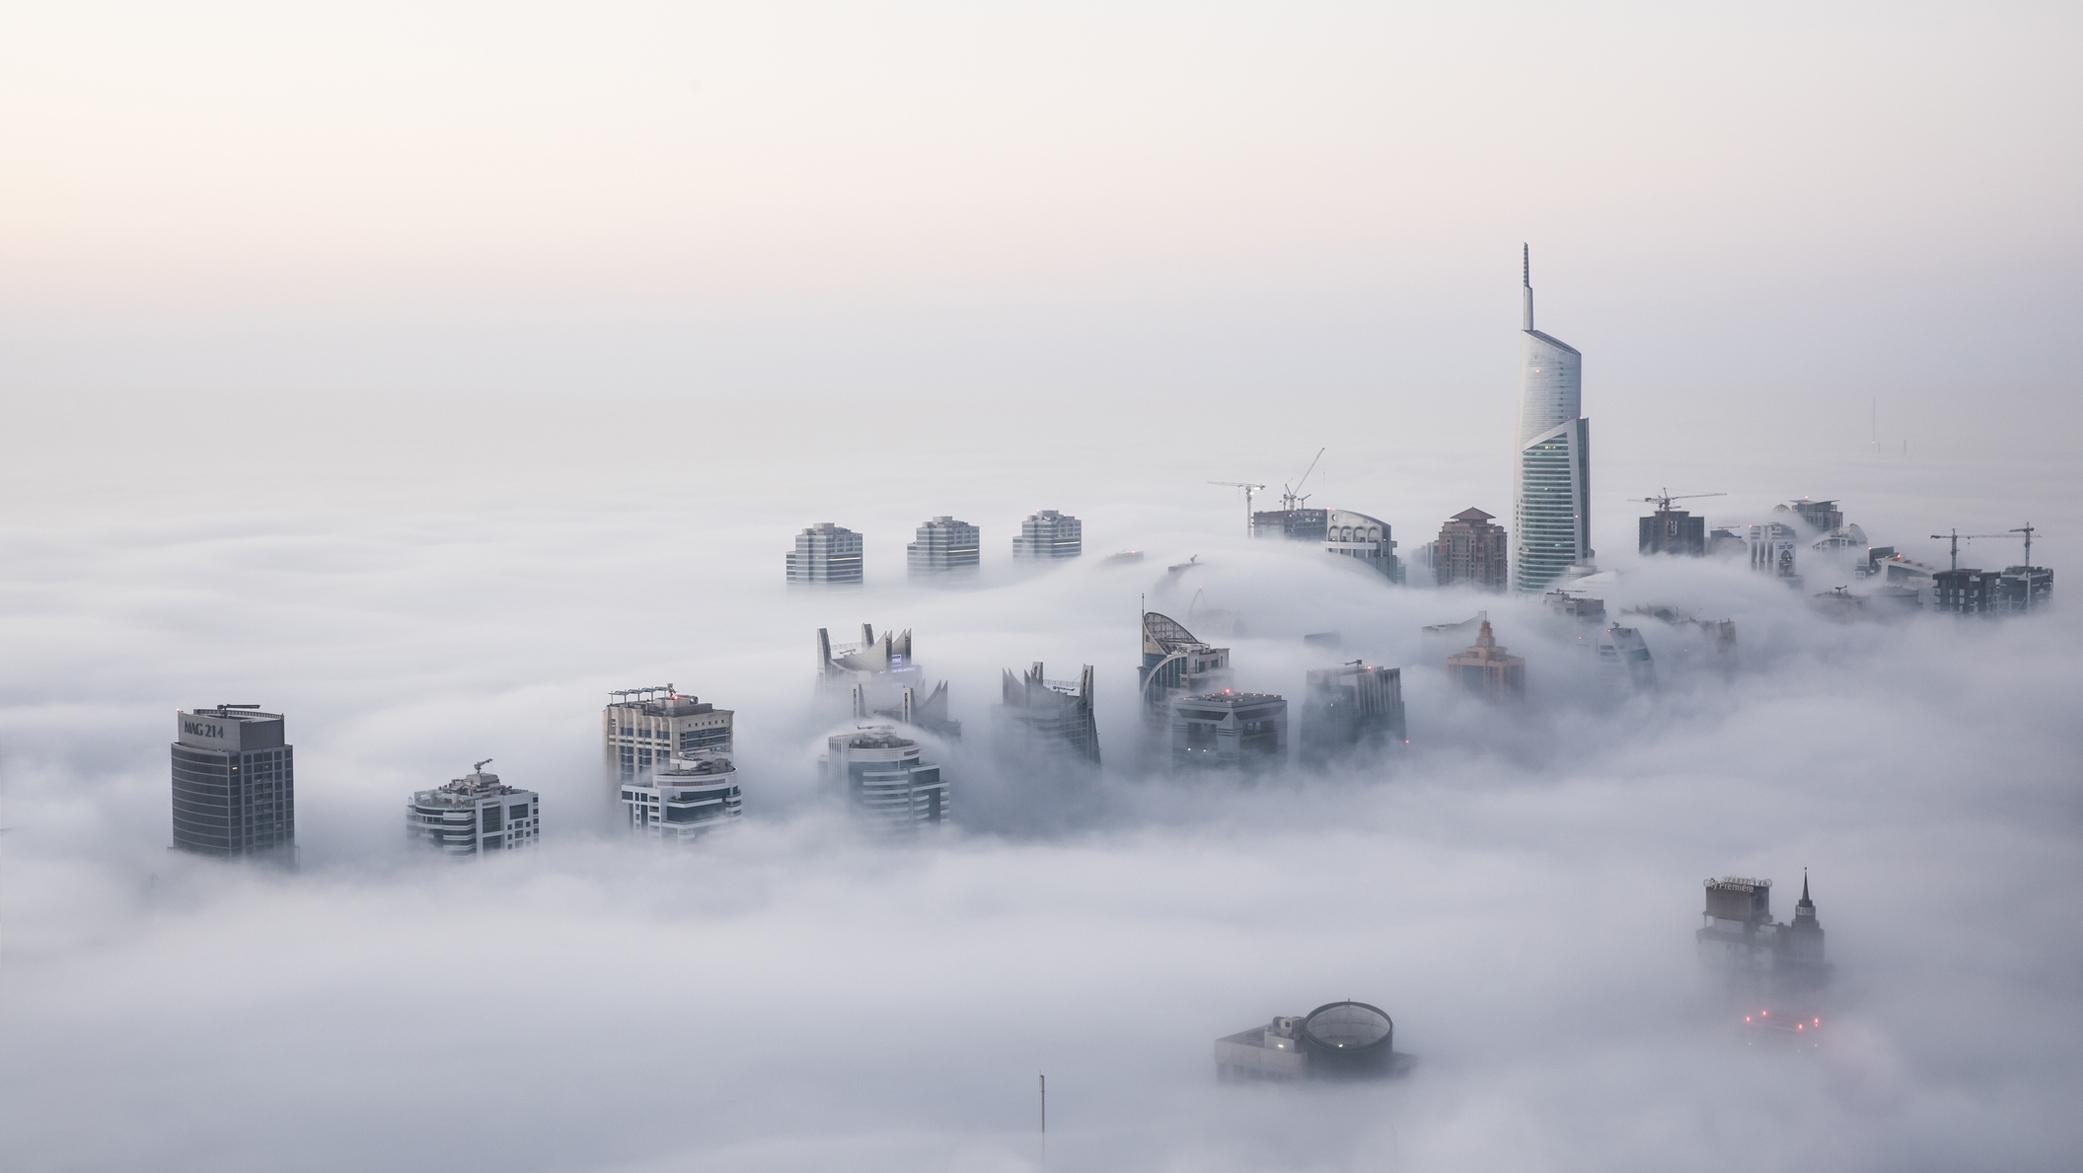 Aerial photo of Dubai in clouds